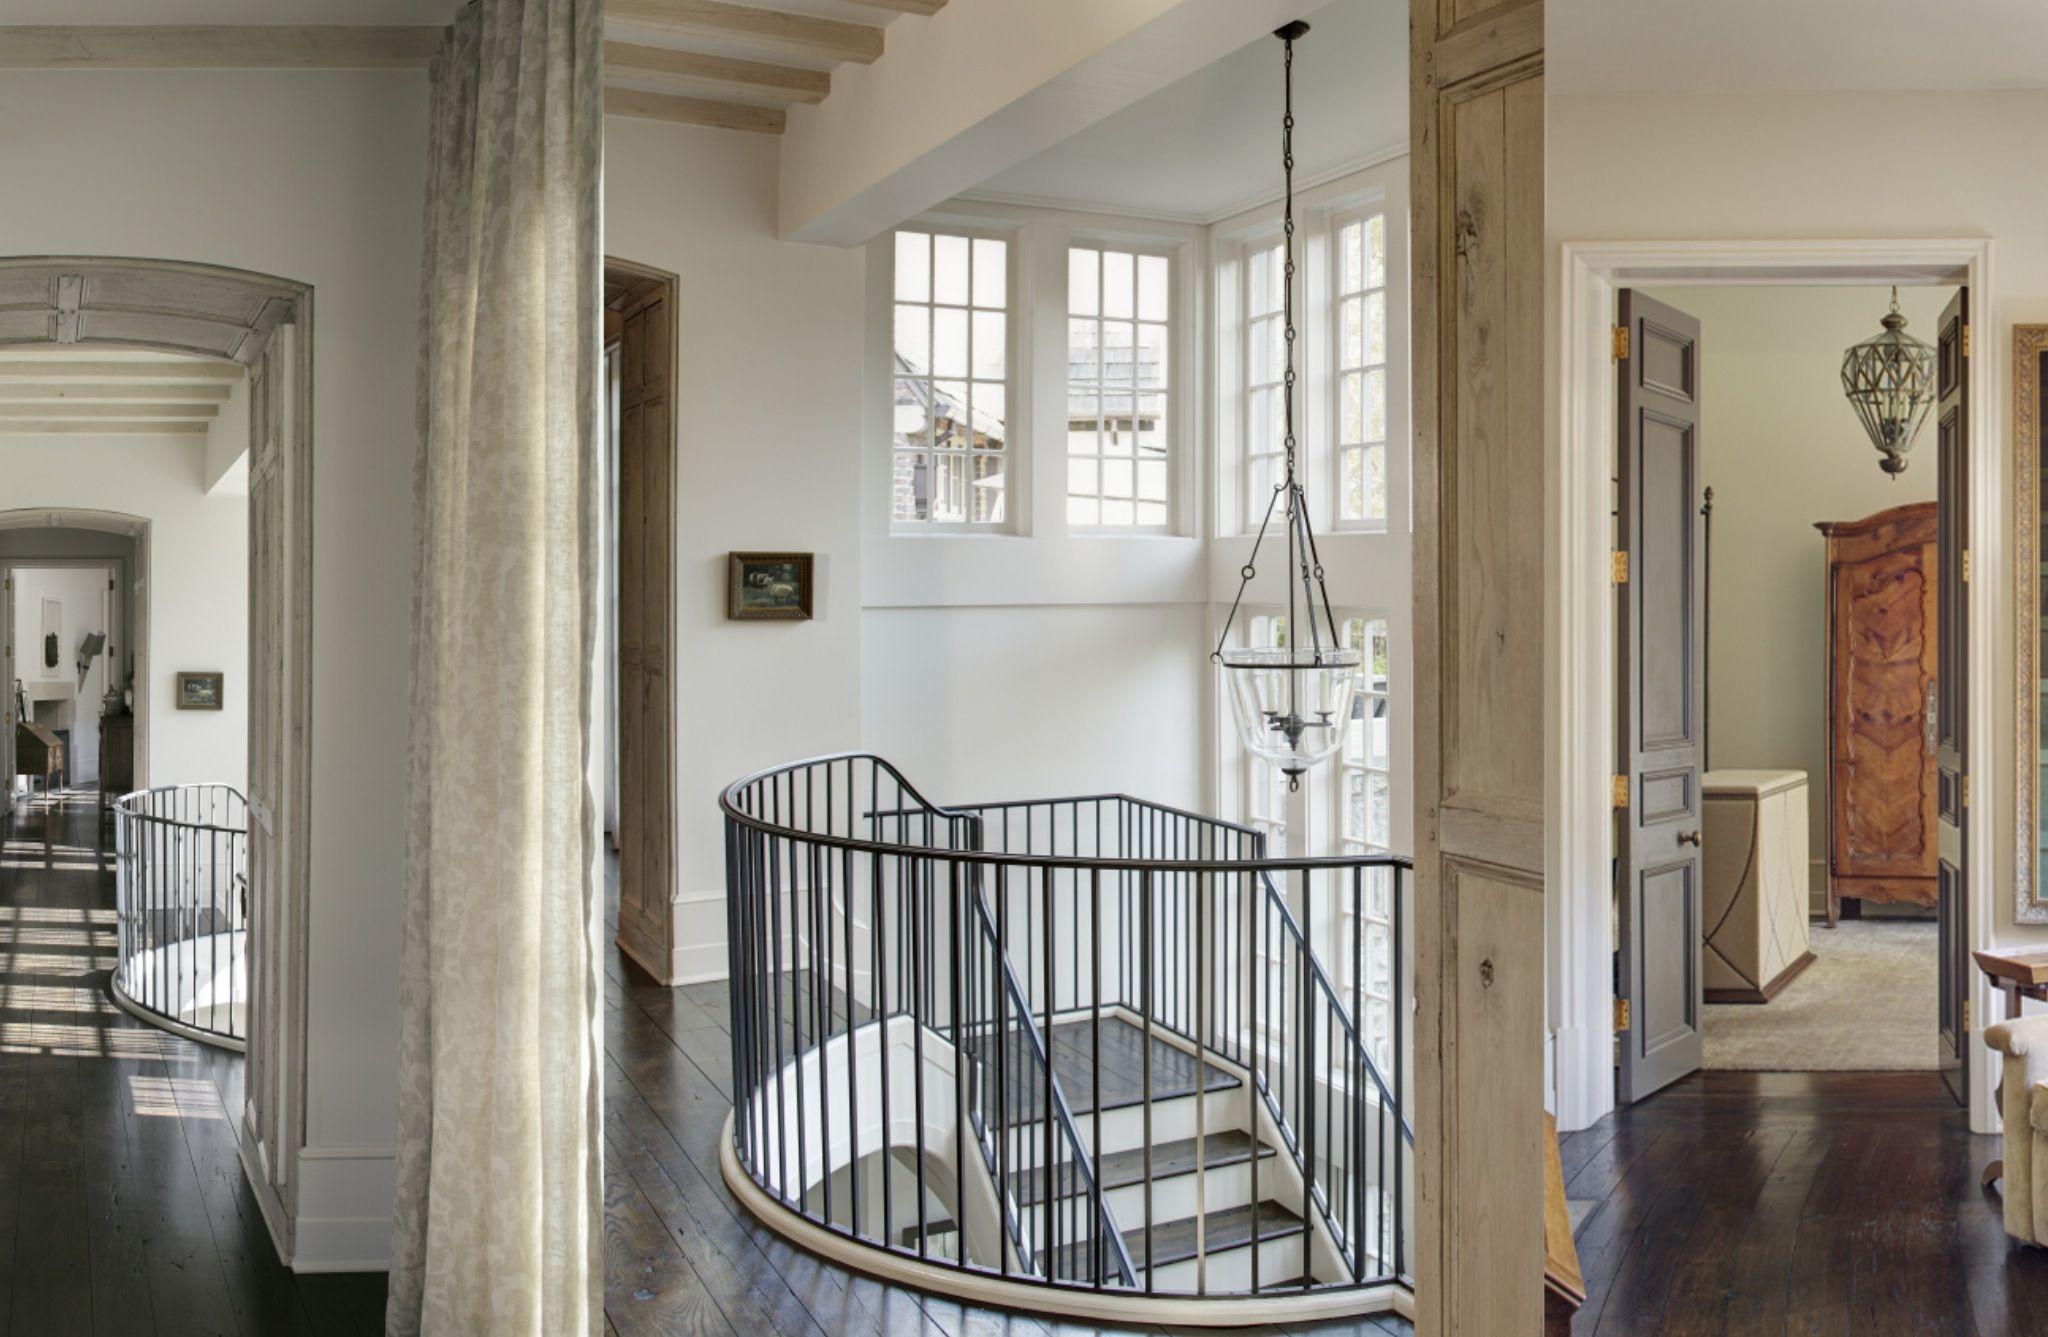 Home interior railings bill ingram architect lake martin alabama llingramarchitect